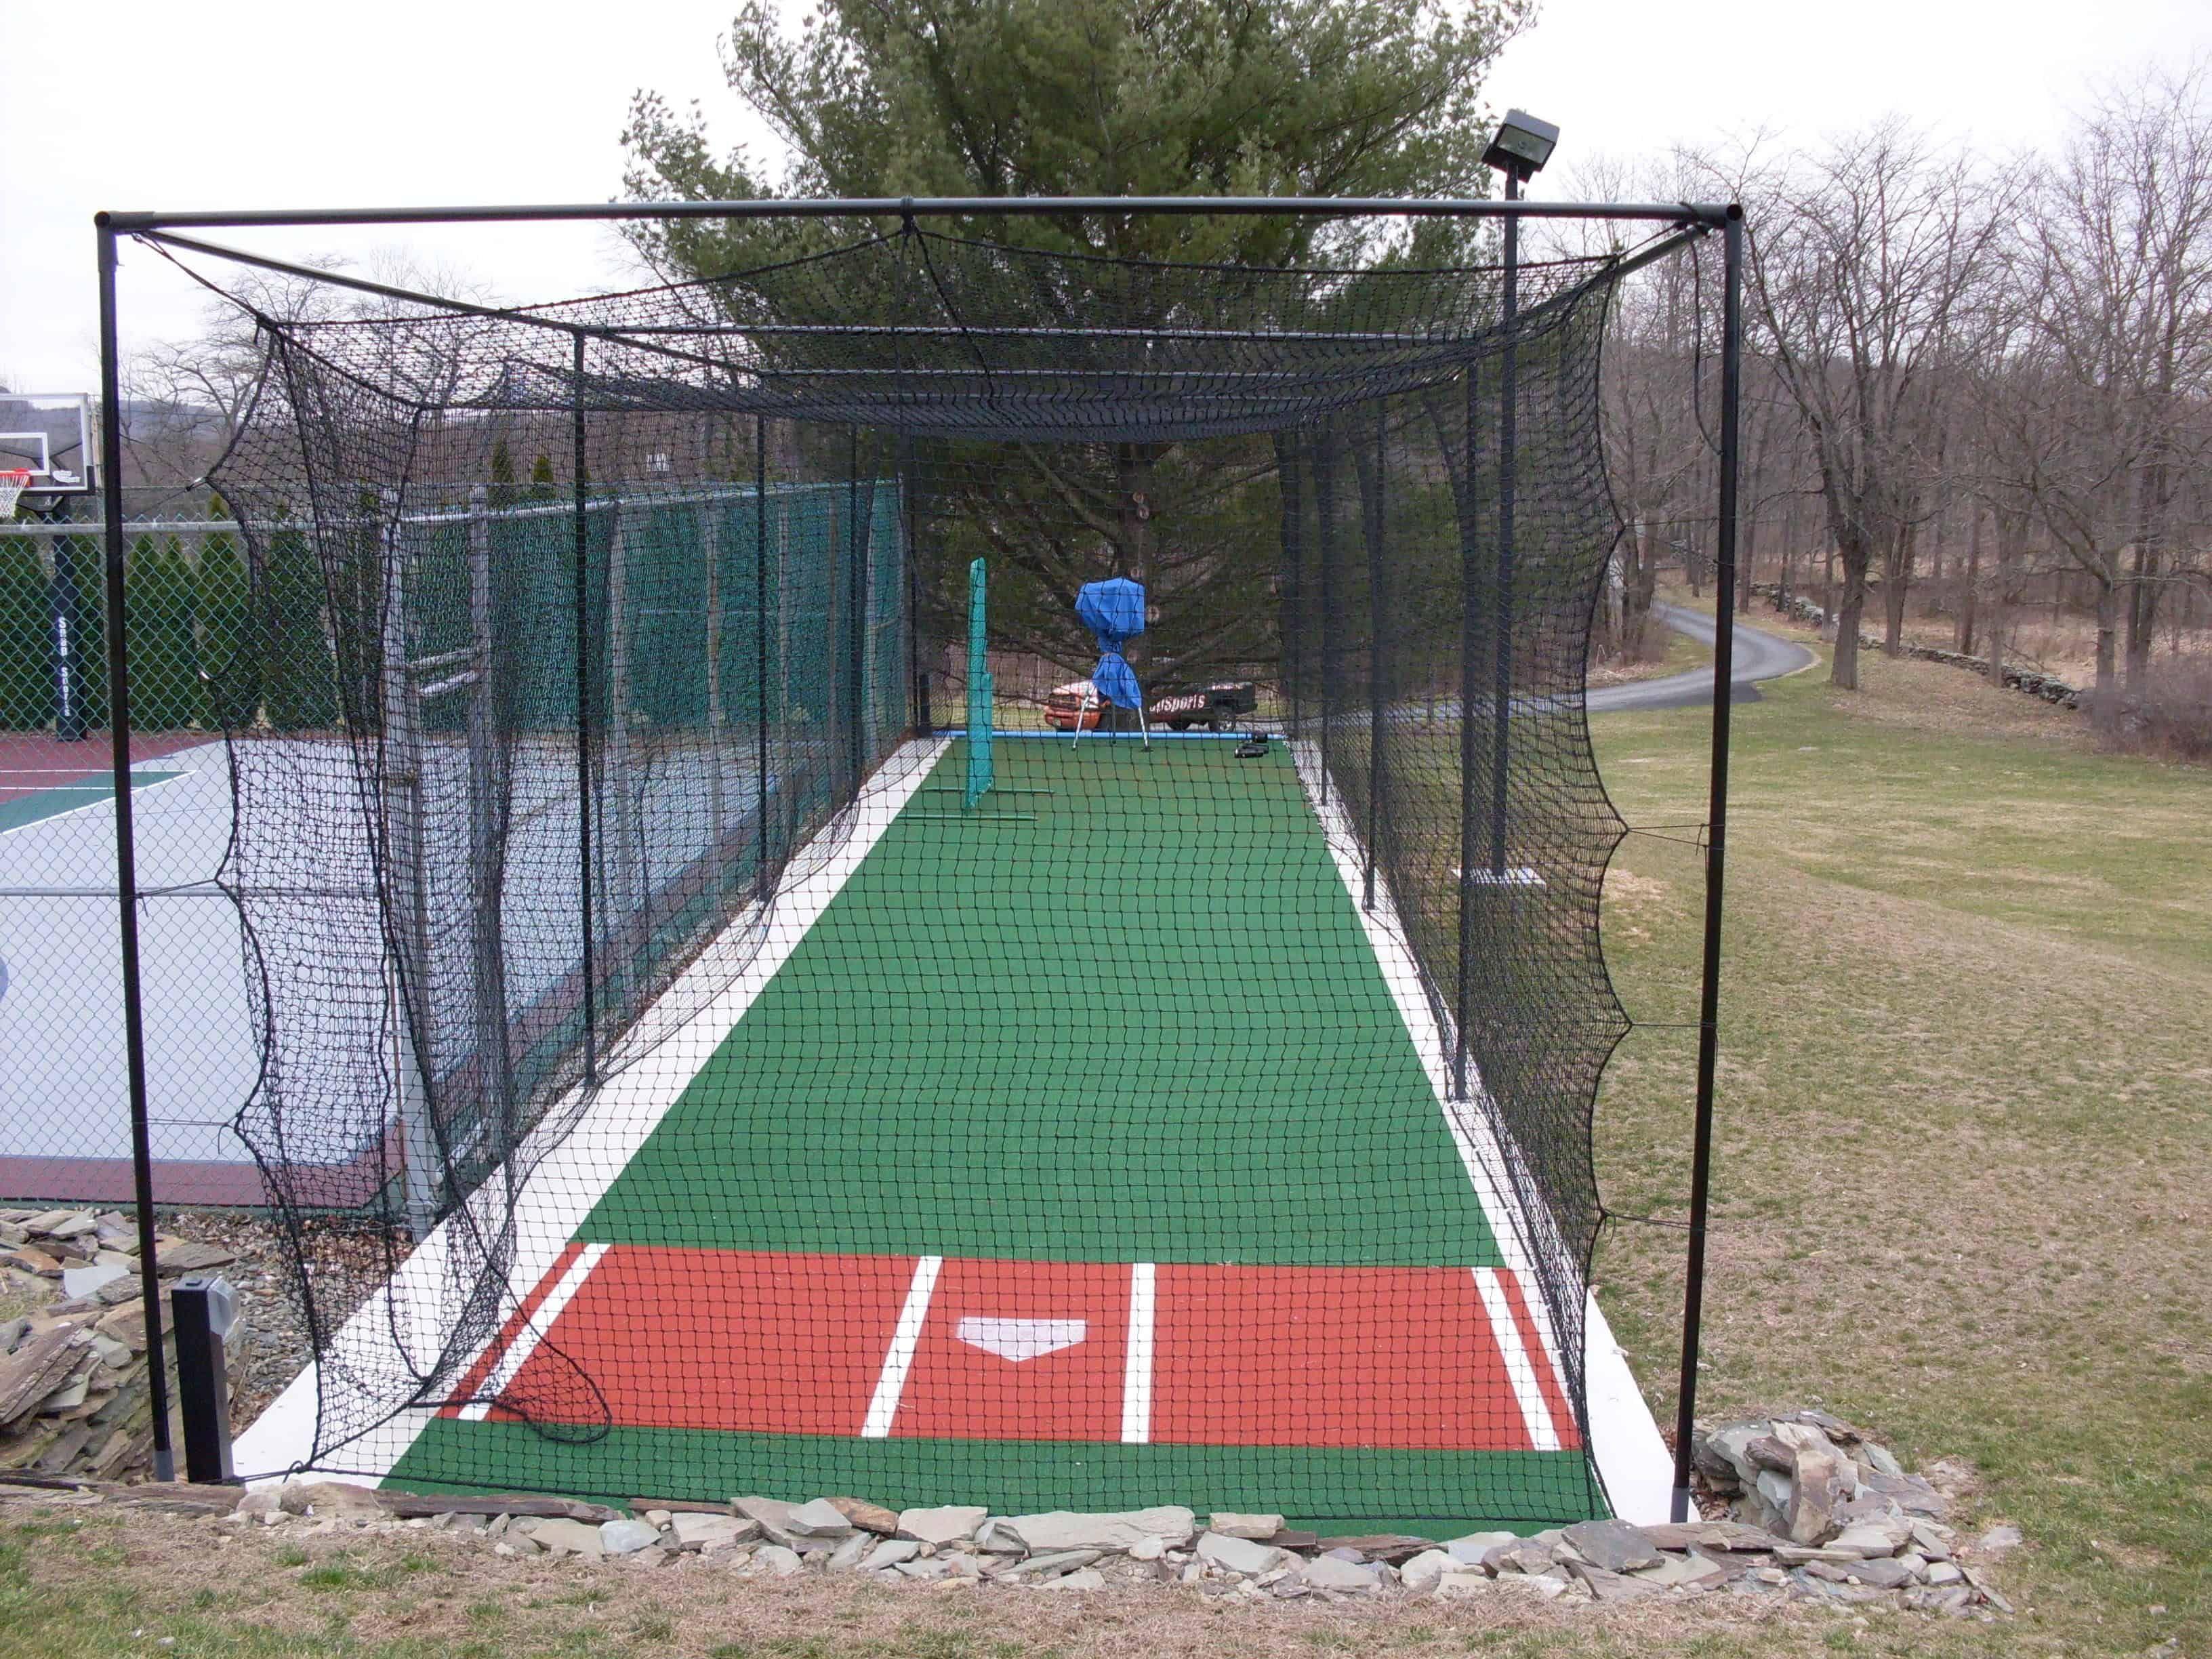 20 Smart Ideas How To Make Backyard Batting Cage Ideas Batting Cage Backyard Backyard Baseball Backyard Sports